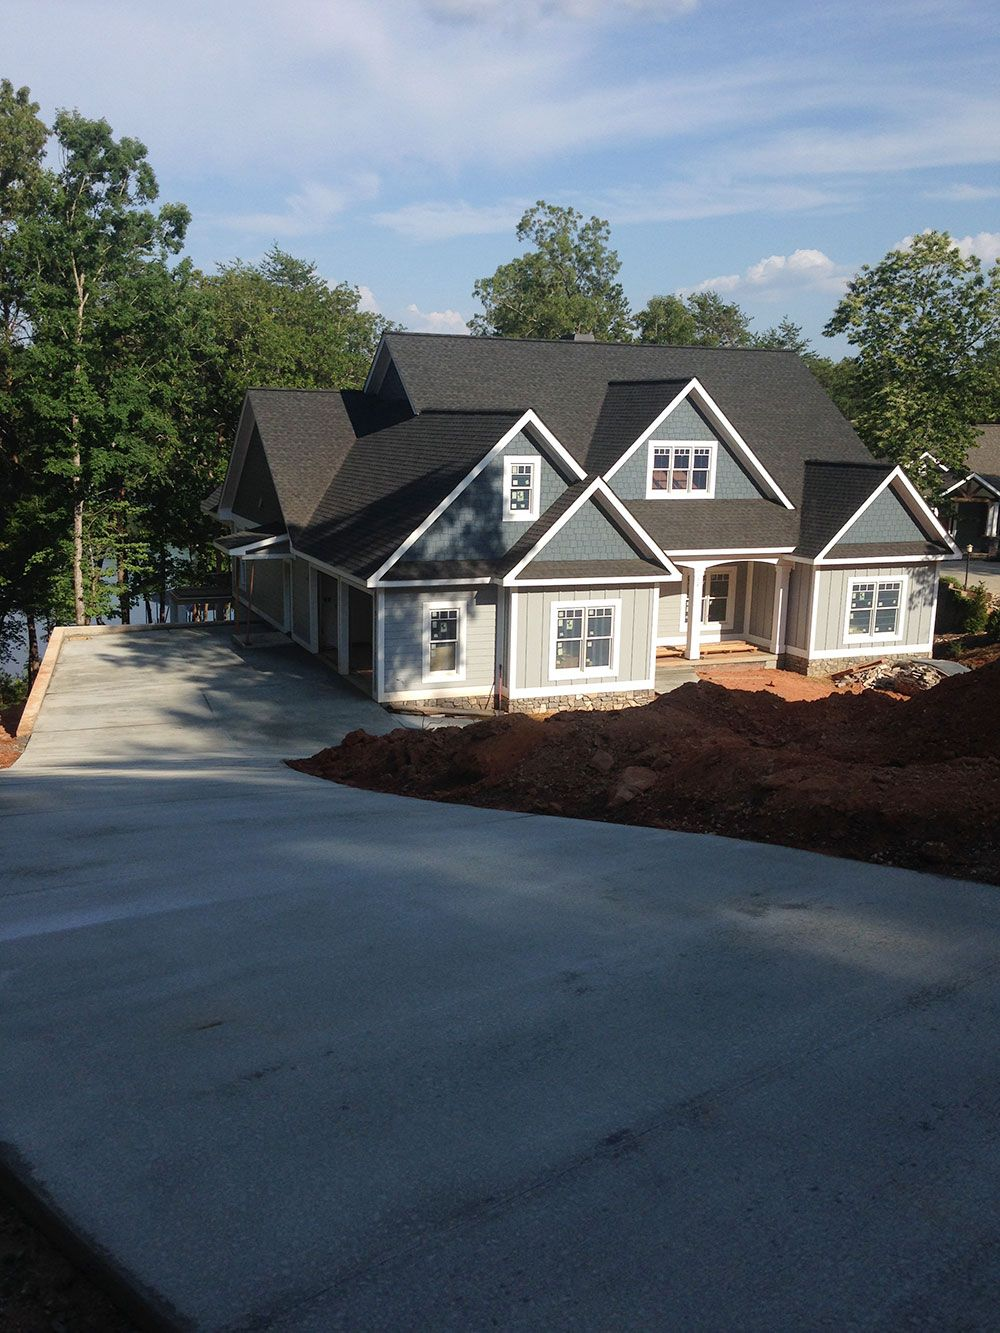 Craftsman Style Lake House Plan with Walkout